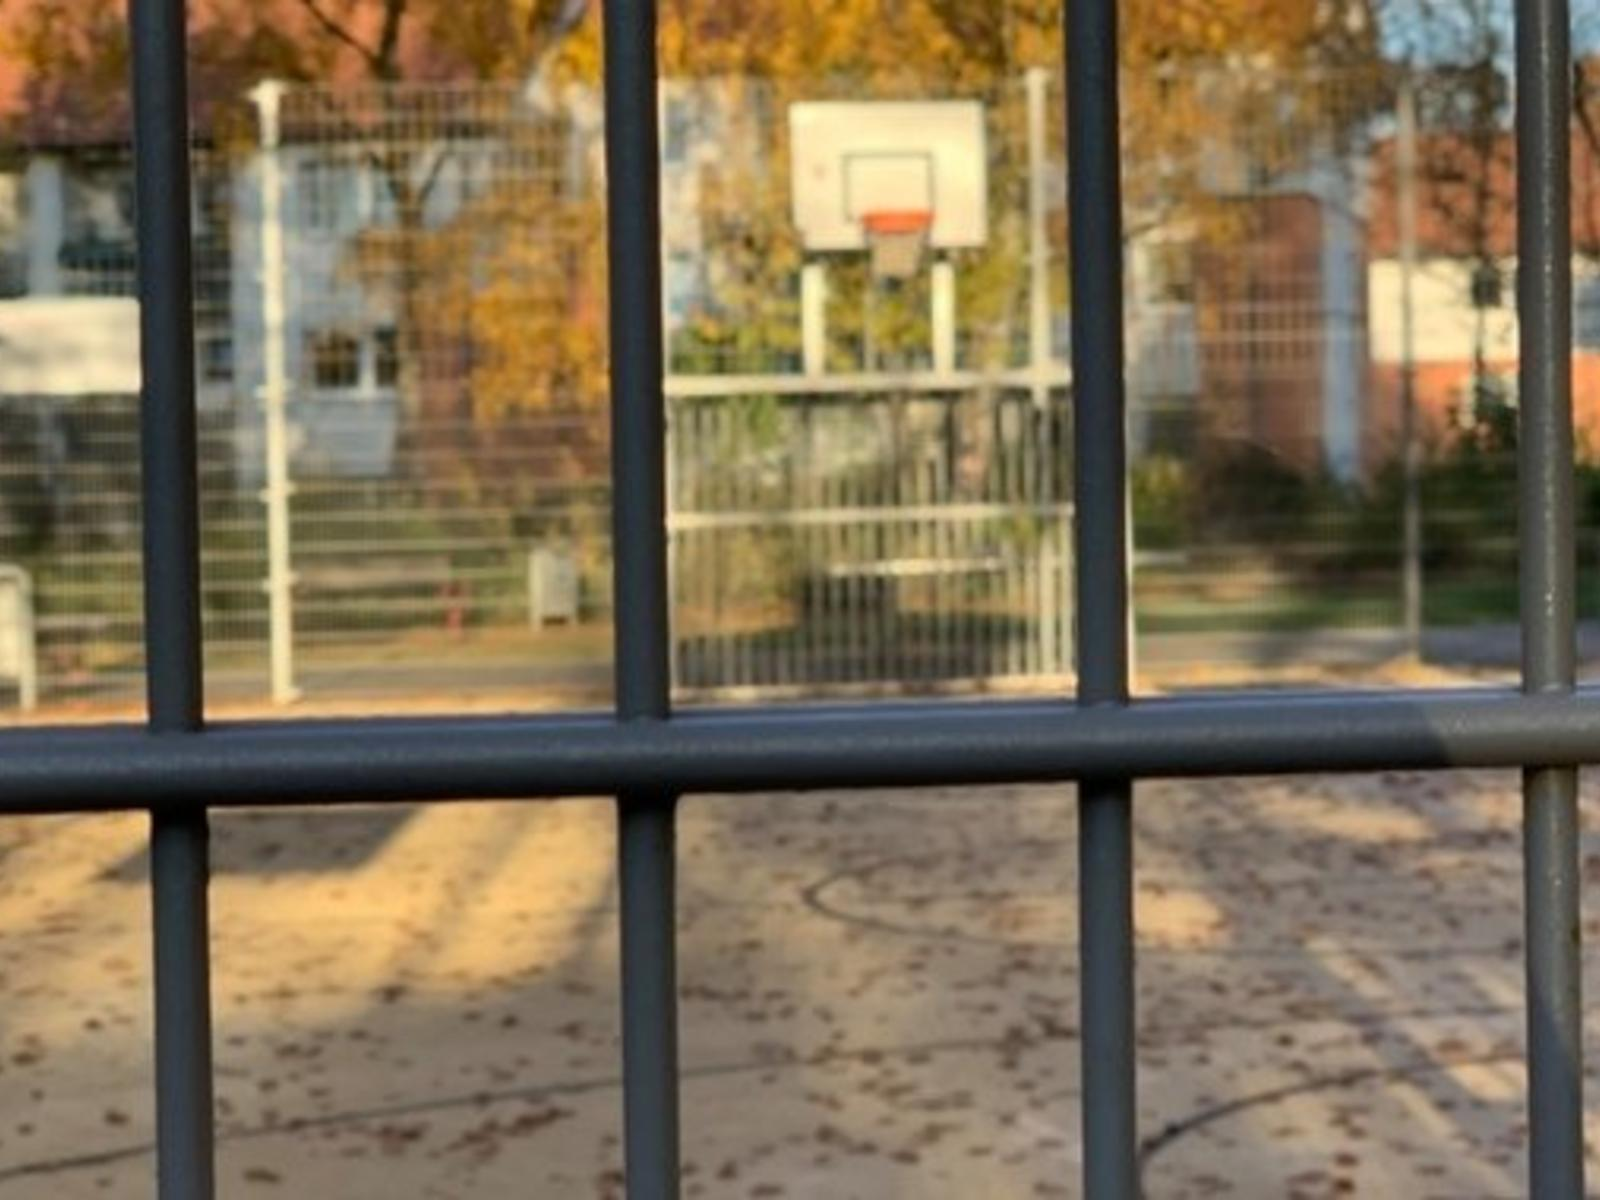 Full Size of Lärmschutzwand Garten Kosten 70000 Euro Fr Lrmschutz Sdstadtpark Kicken Hinter Der Wand Loungemöbel Holz Spielhaus Schallschutz Fenster Erneuern Bewässerung Garten Lärmschutzwand Garten Kosten